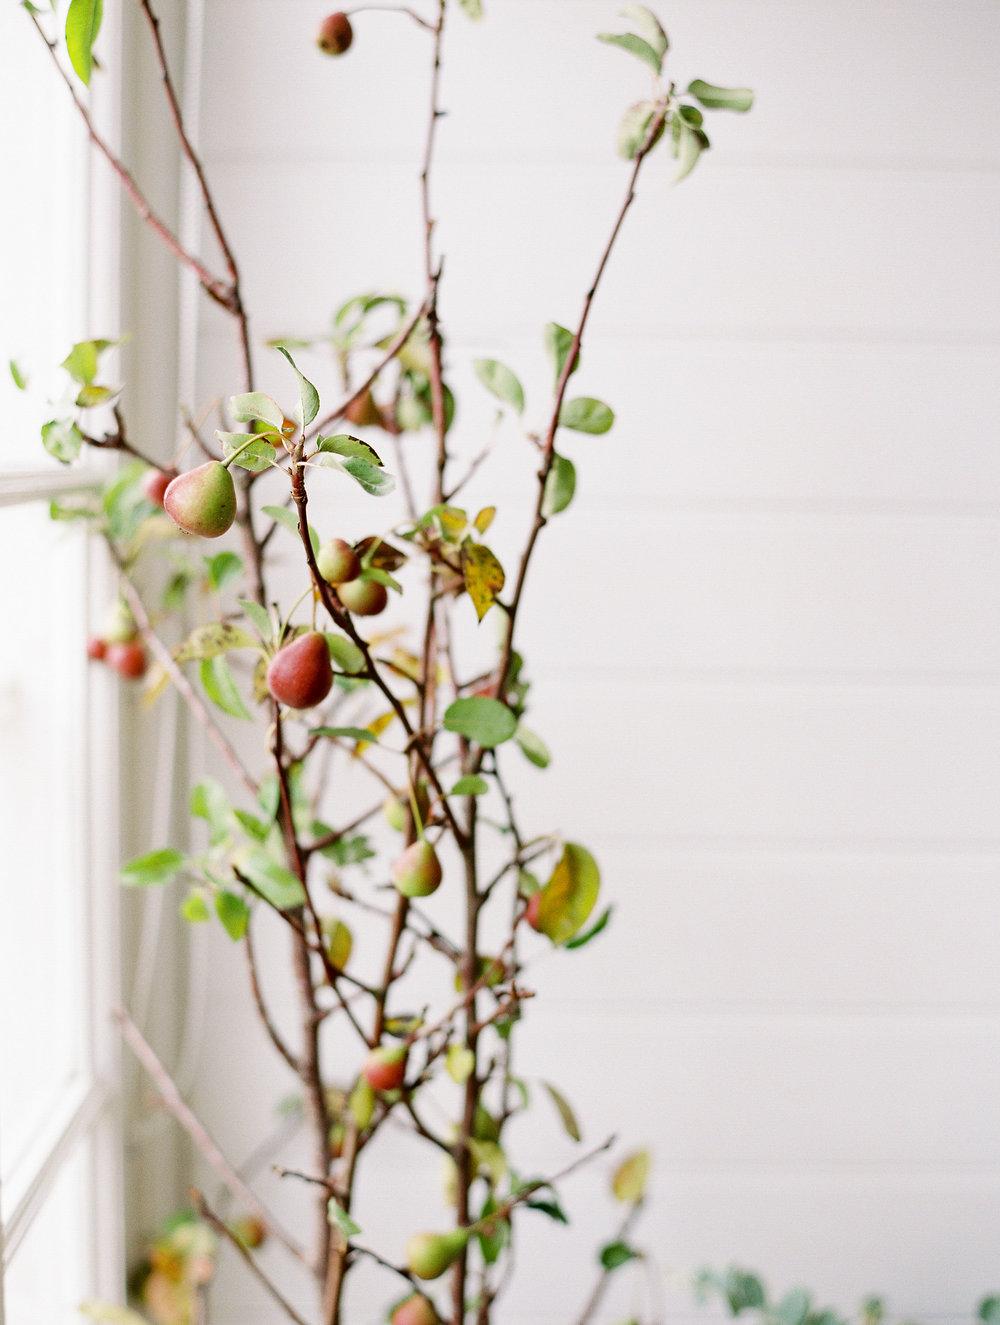 sandra-chau-stylist-floral-florist-branding-lifestyle-shoot-we-are-origami166.jpg